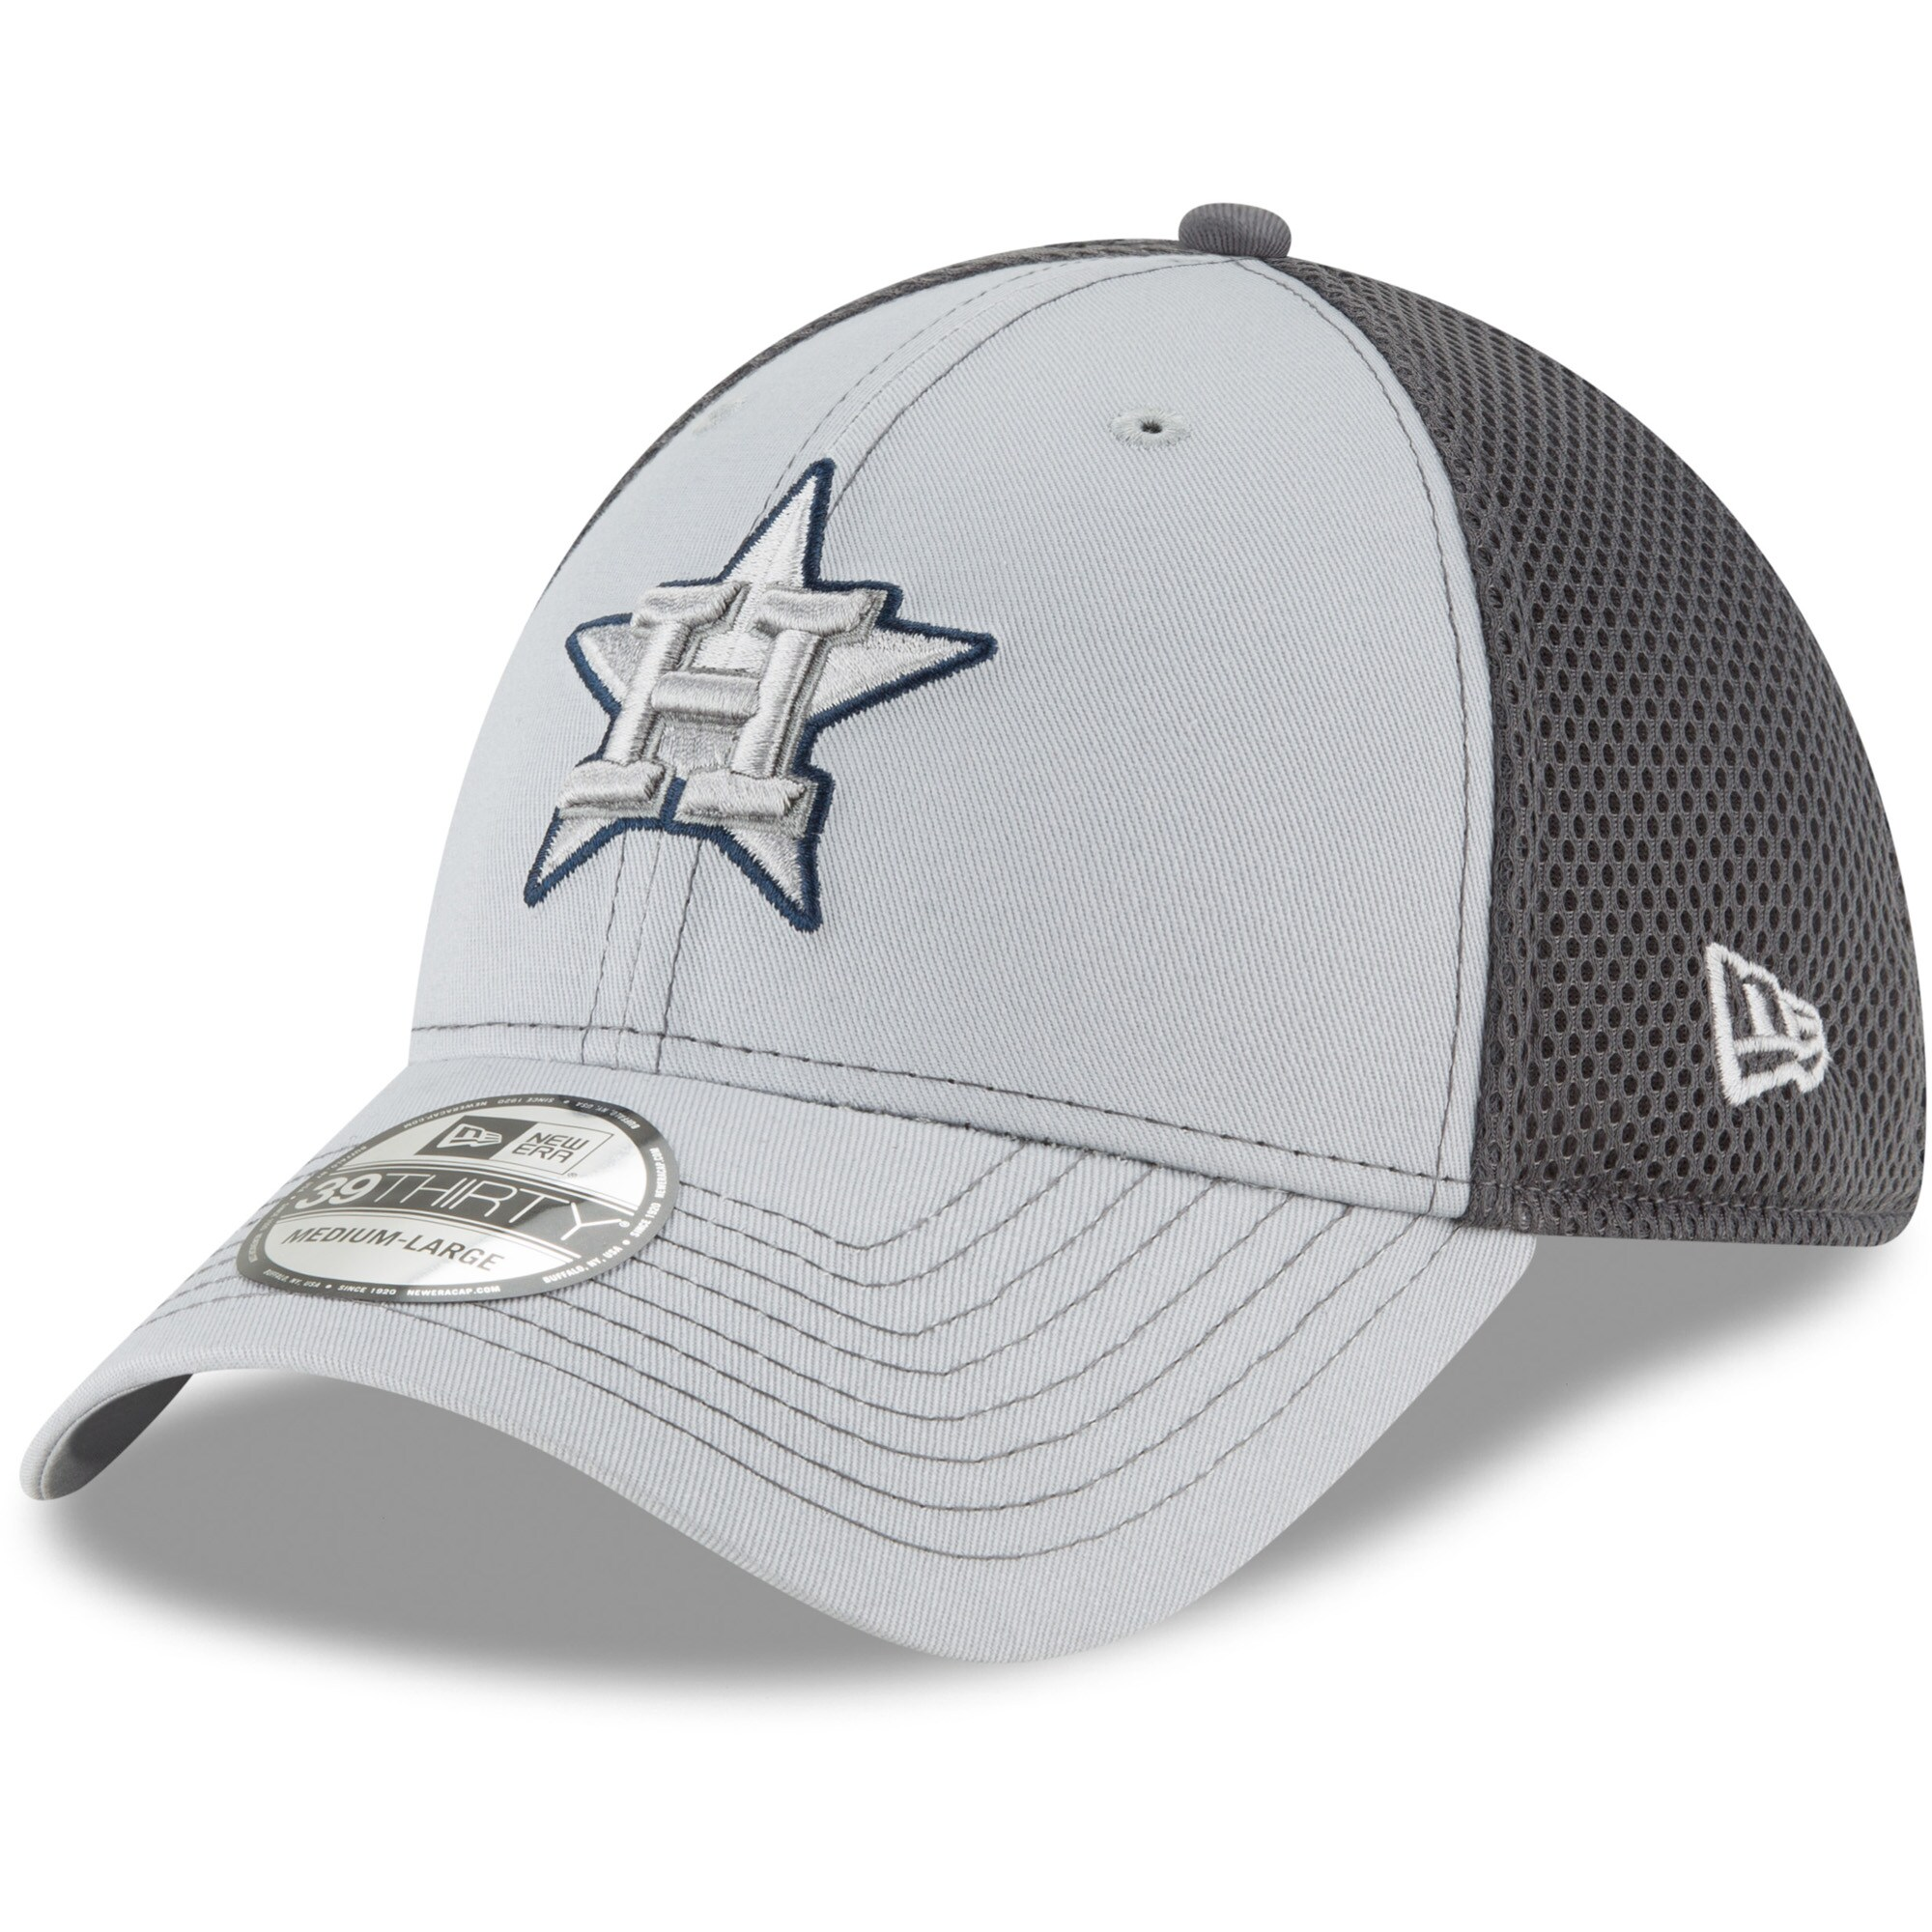 Houston Astros New Era Grayed Out Neo 39THIRTY Flex Hat - Gray